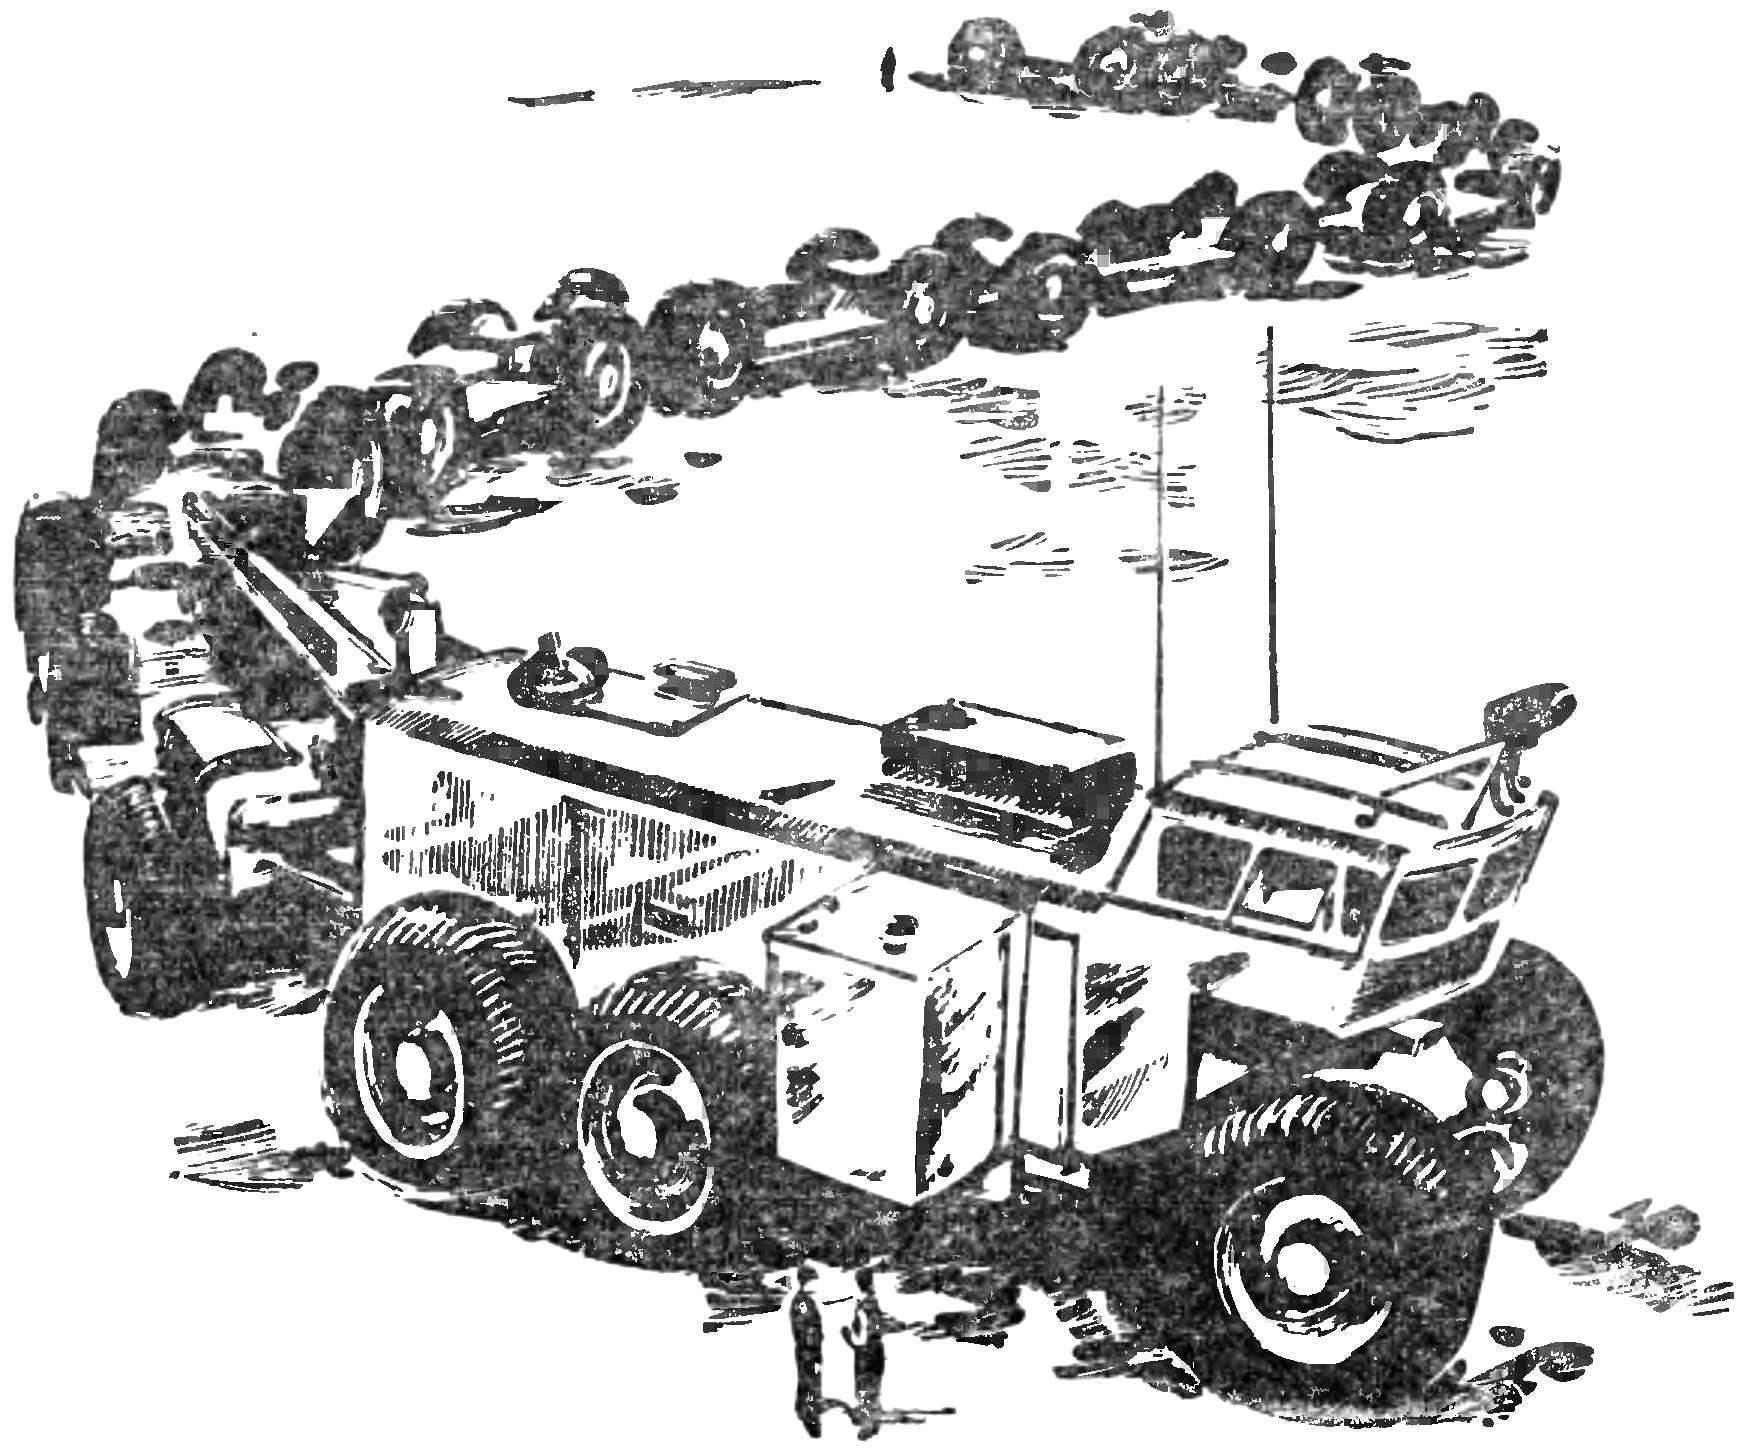 Fig. 9. Giant multi-link road train